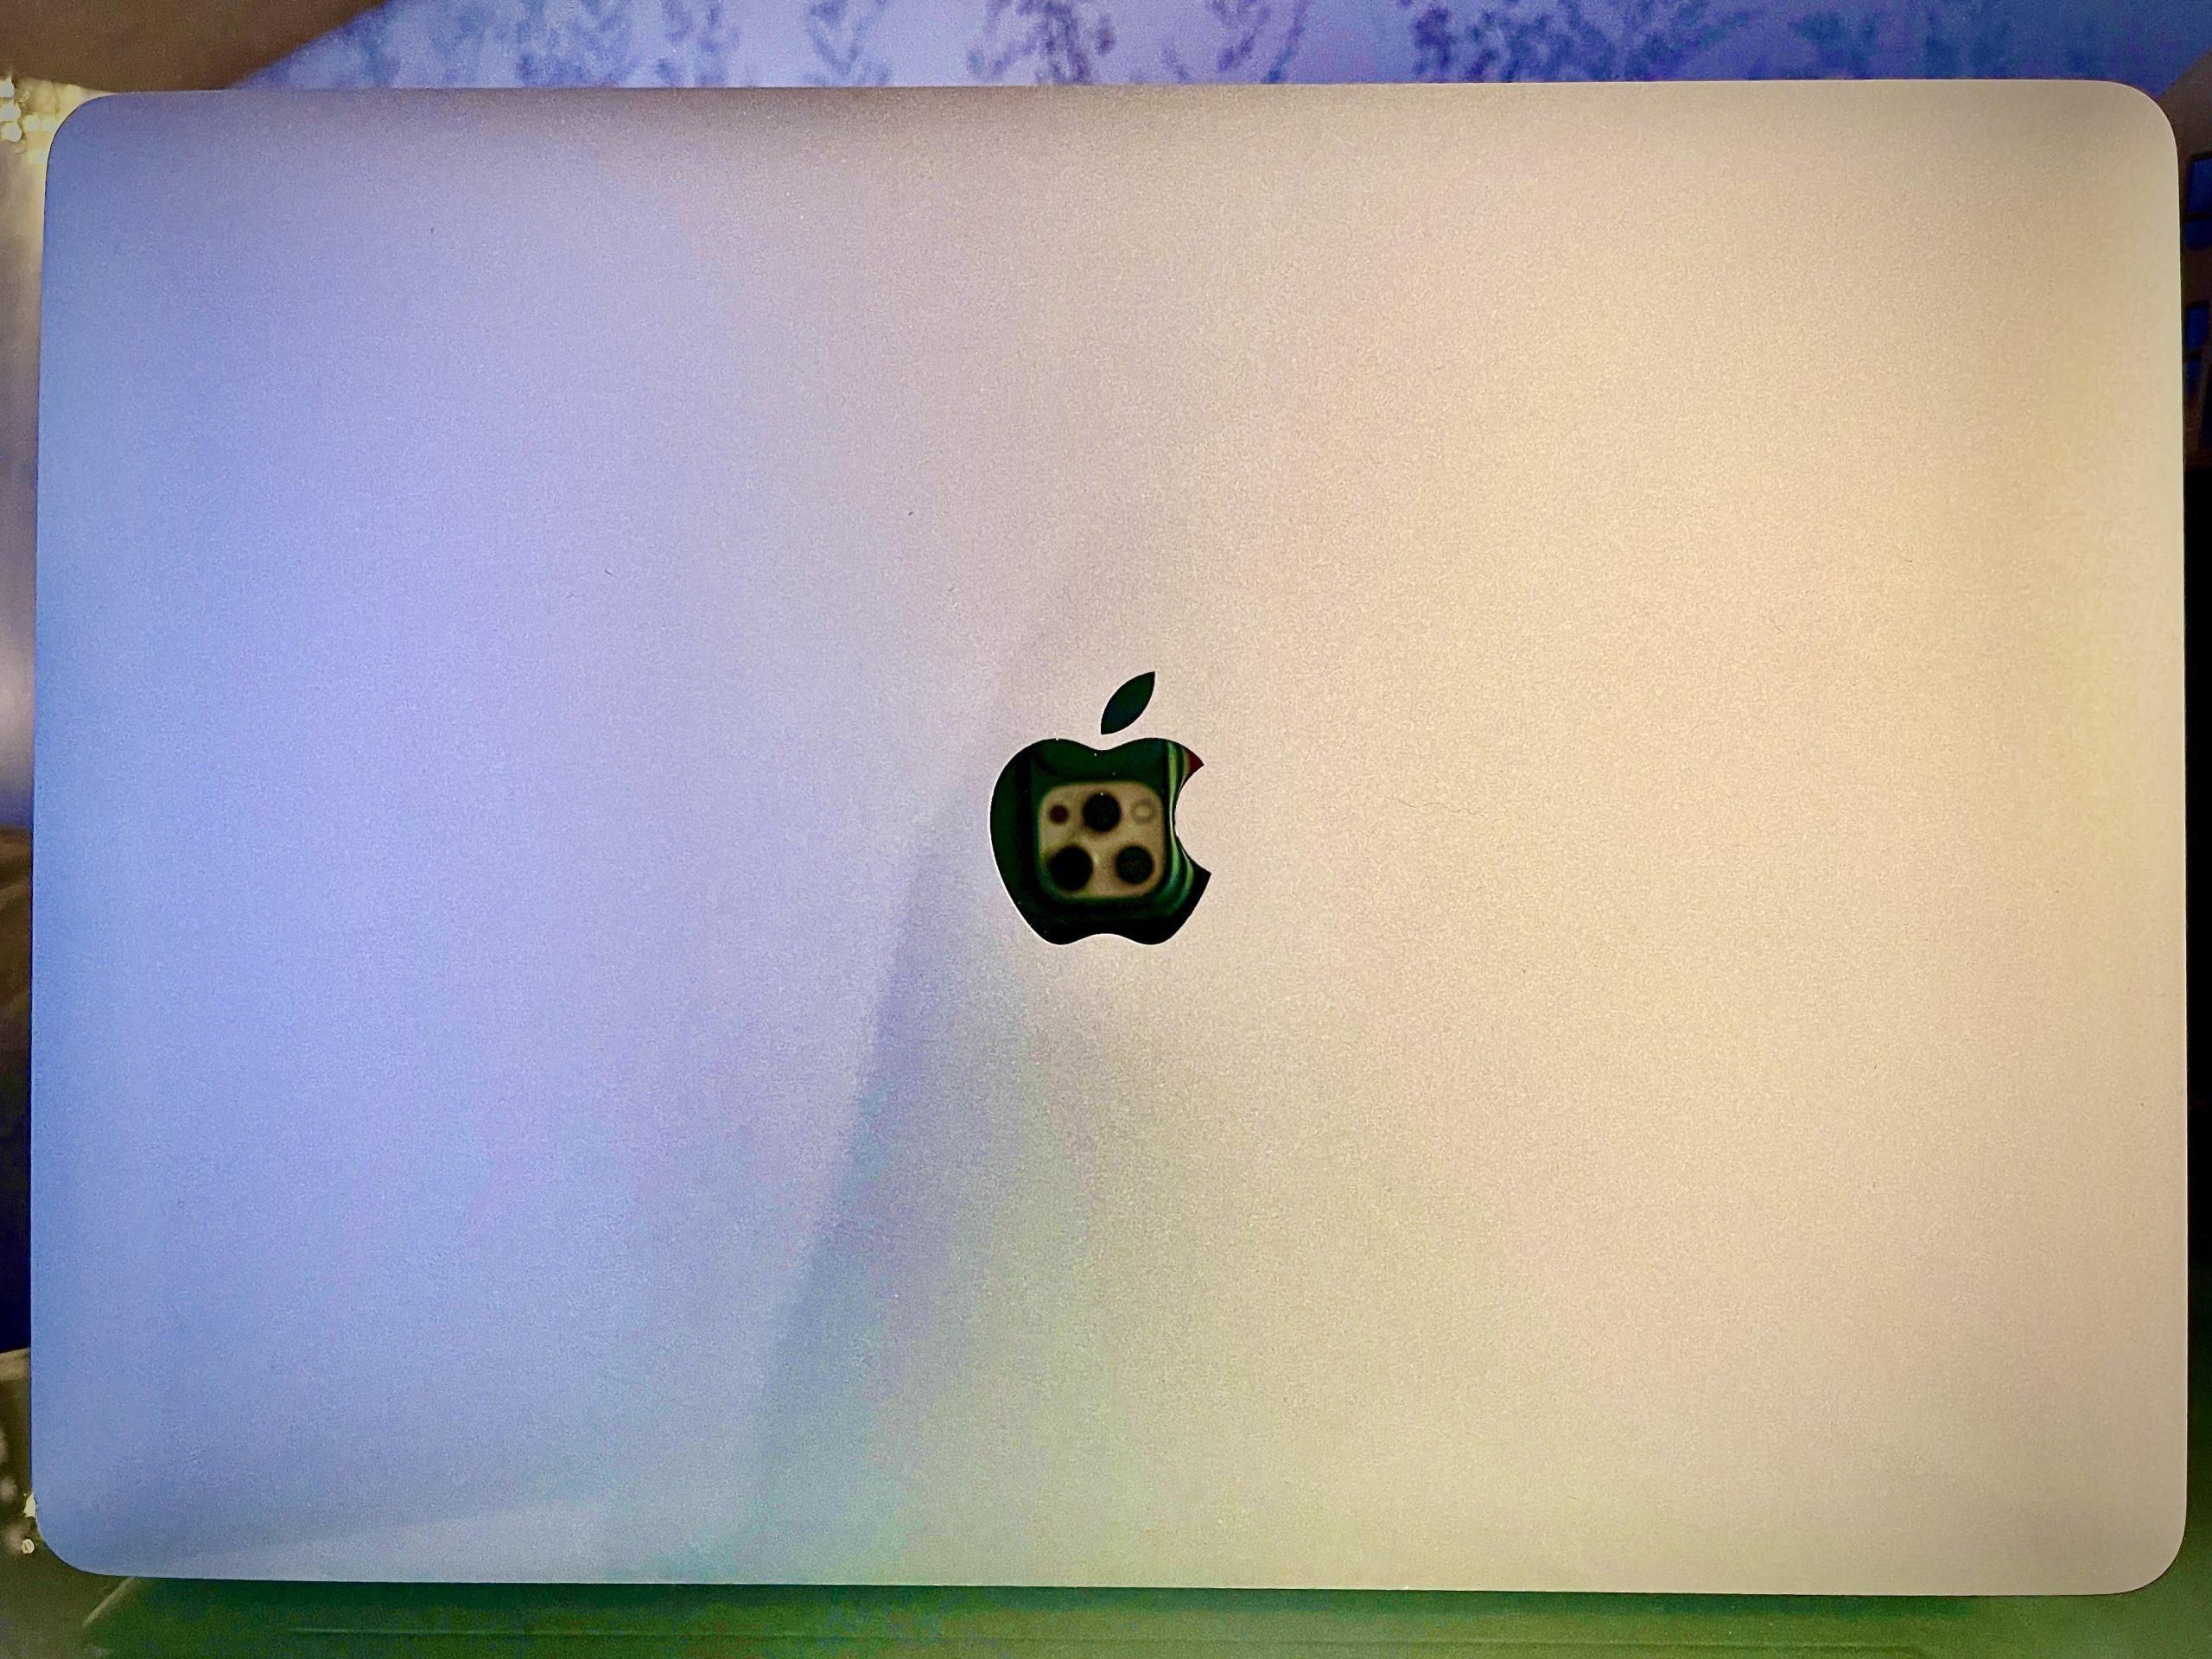 MacBook Air (M1) Big Sur 11.2